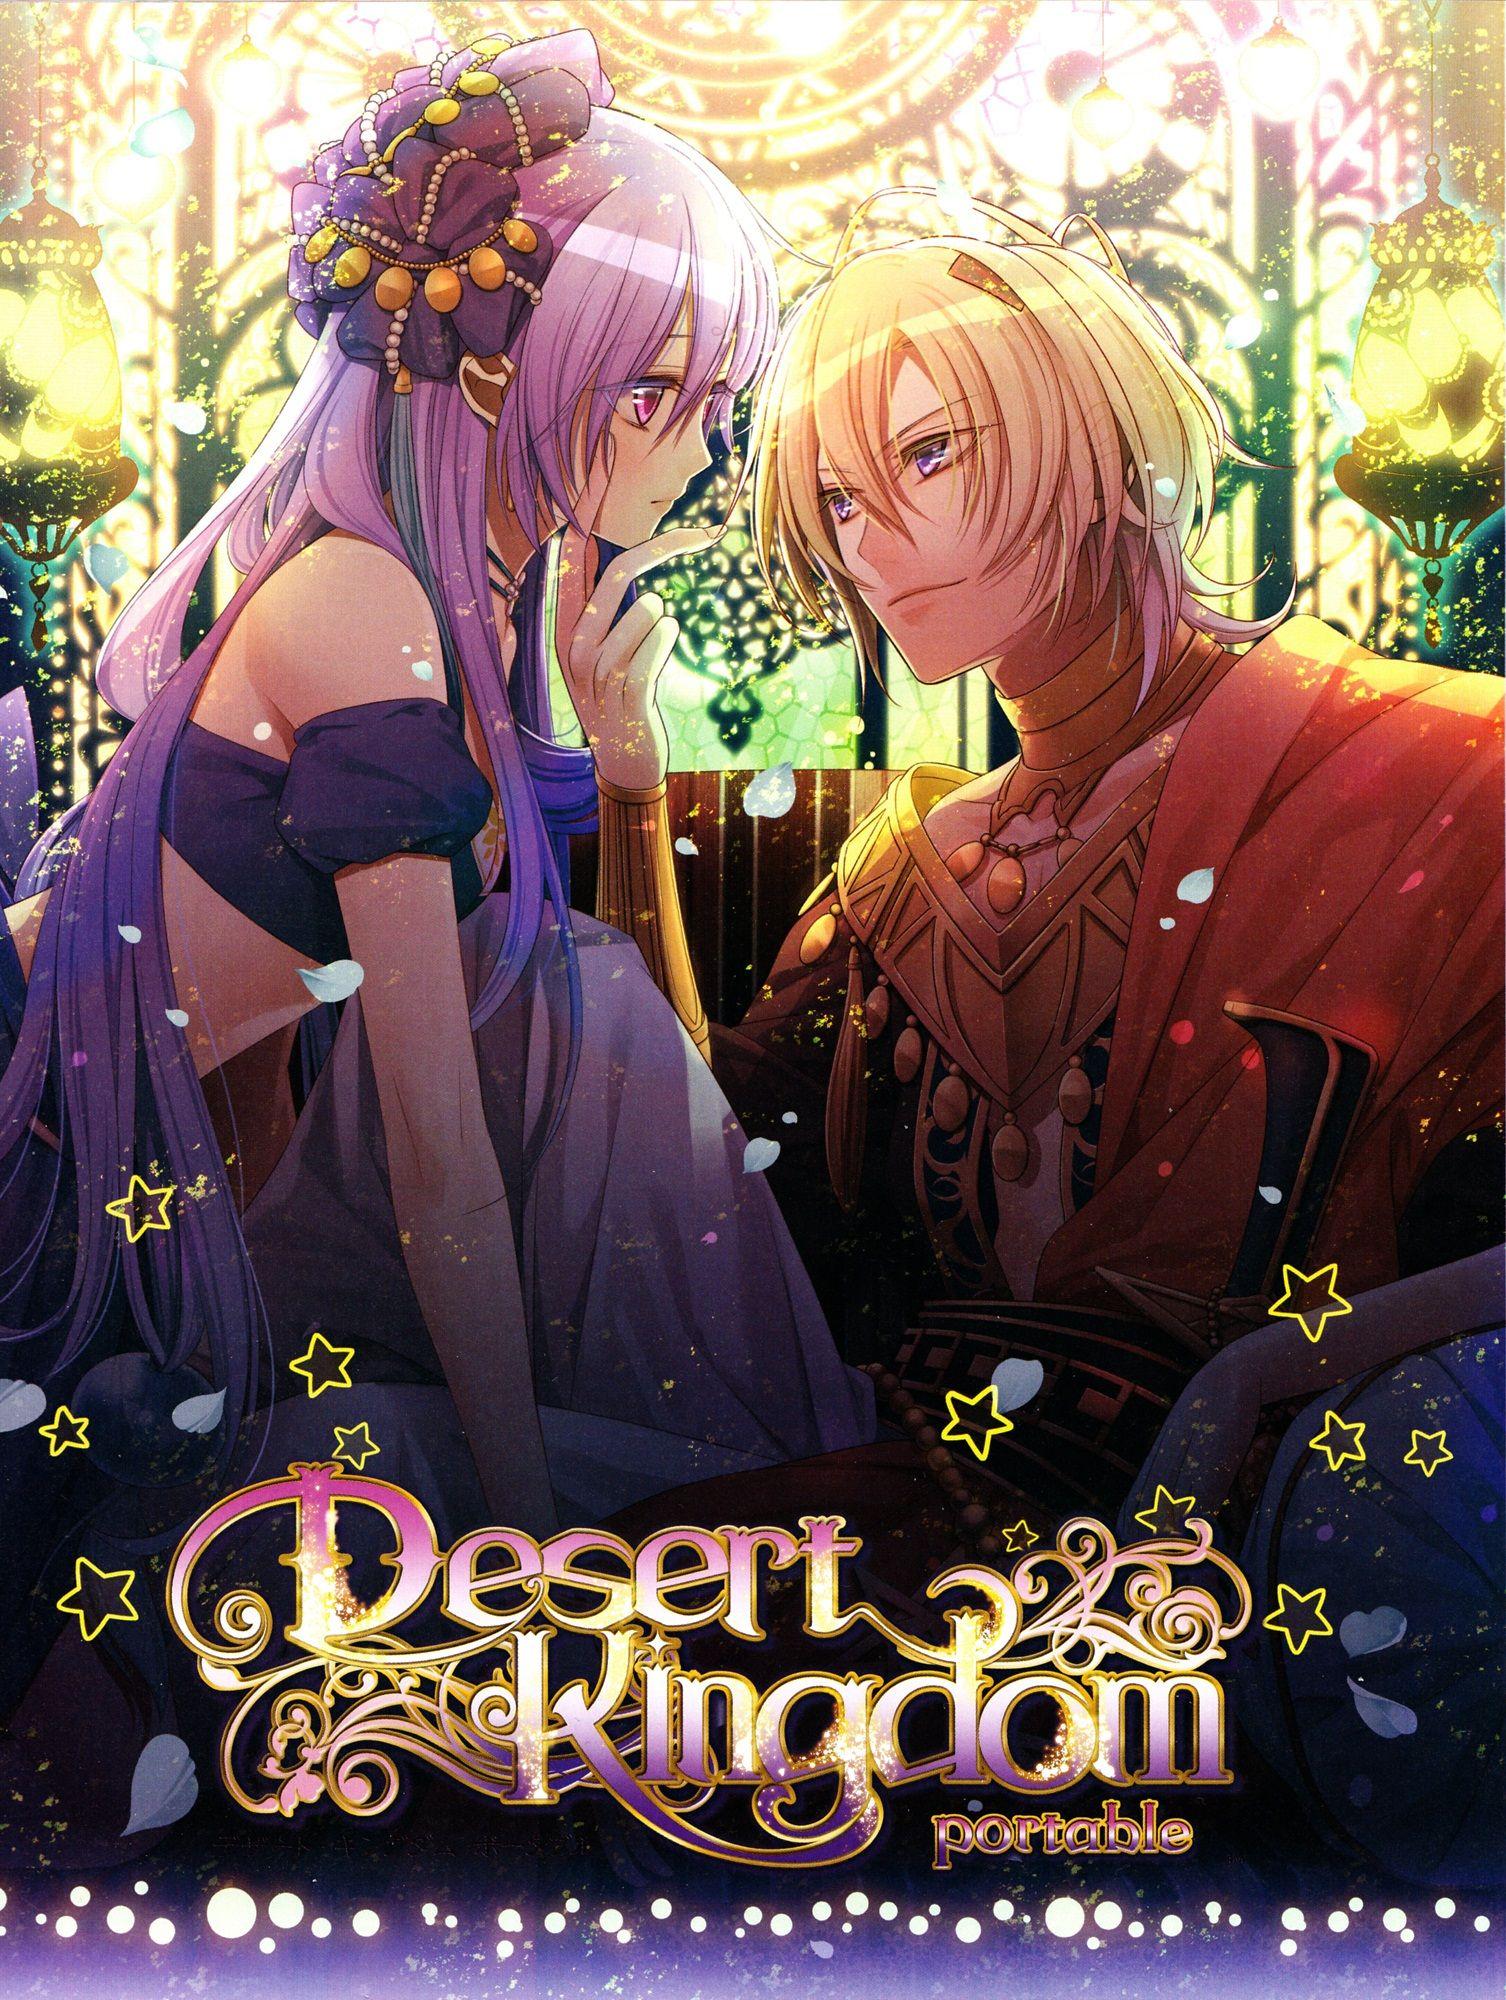 desert kingdom イラスト 綺麗な絵 キングダム